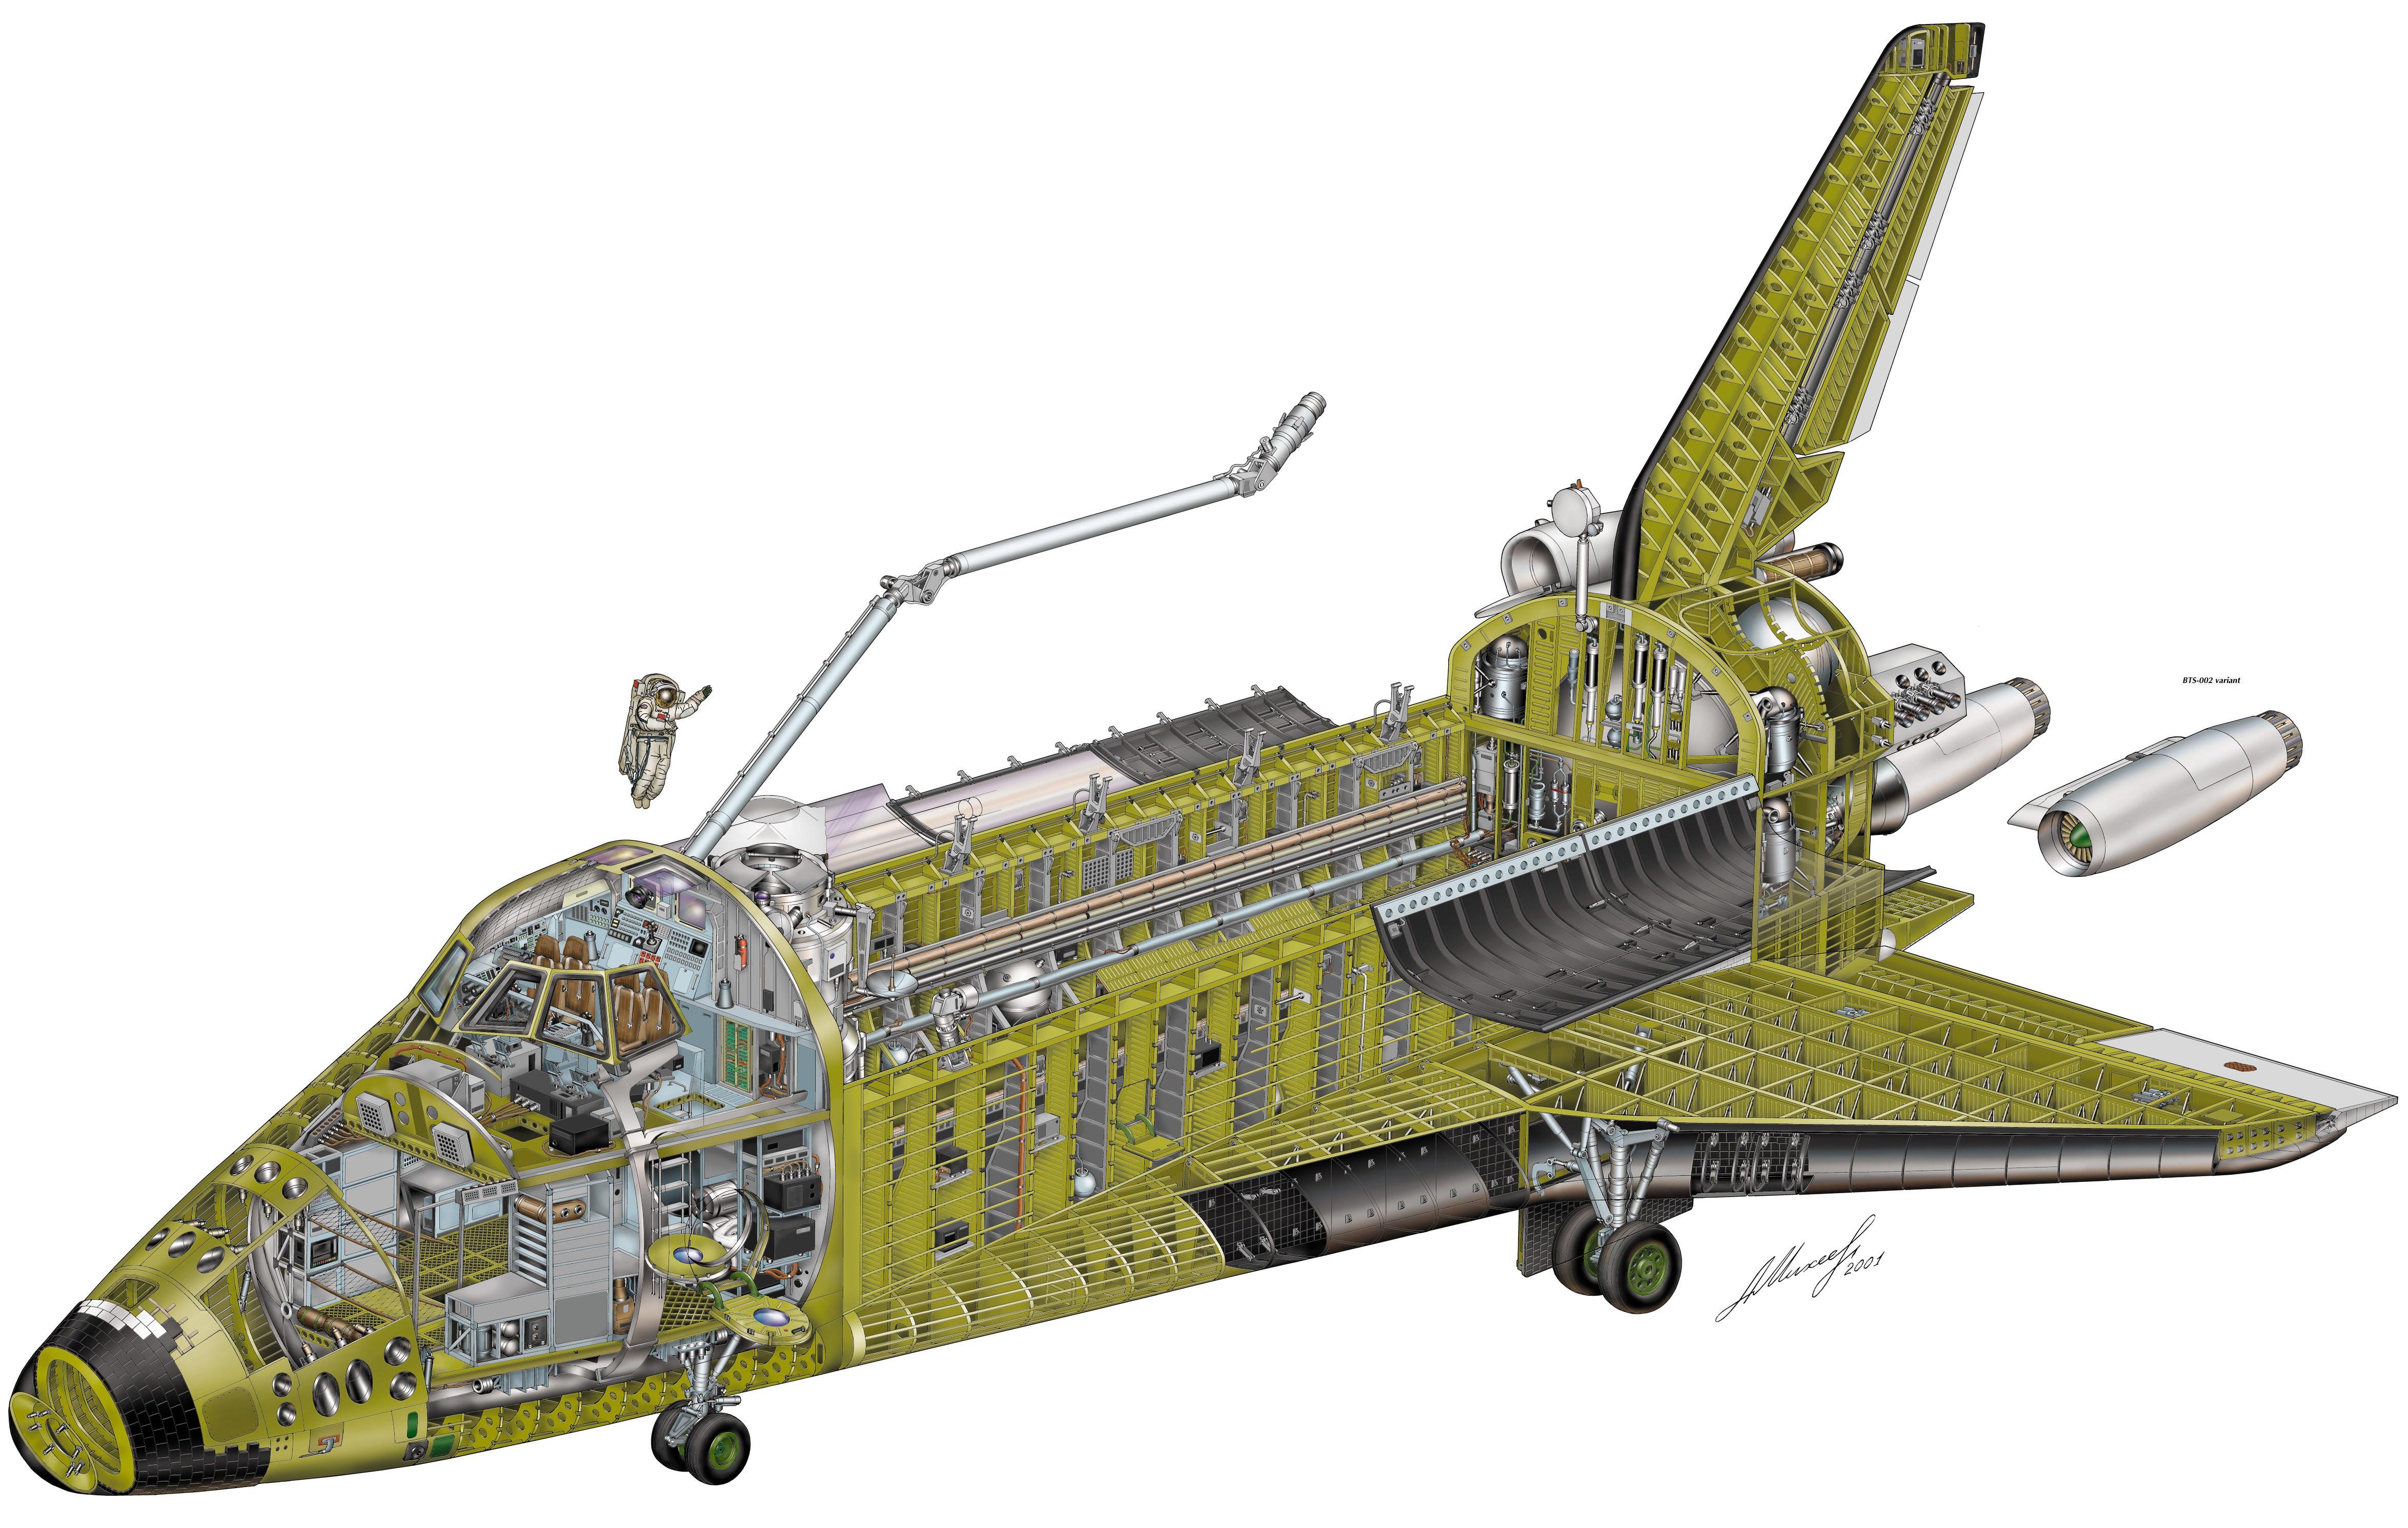 Space Shuttle Buran cutaway